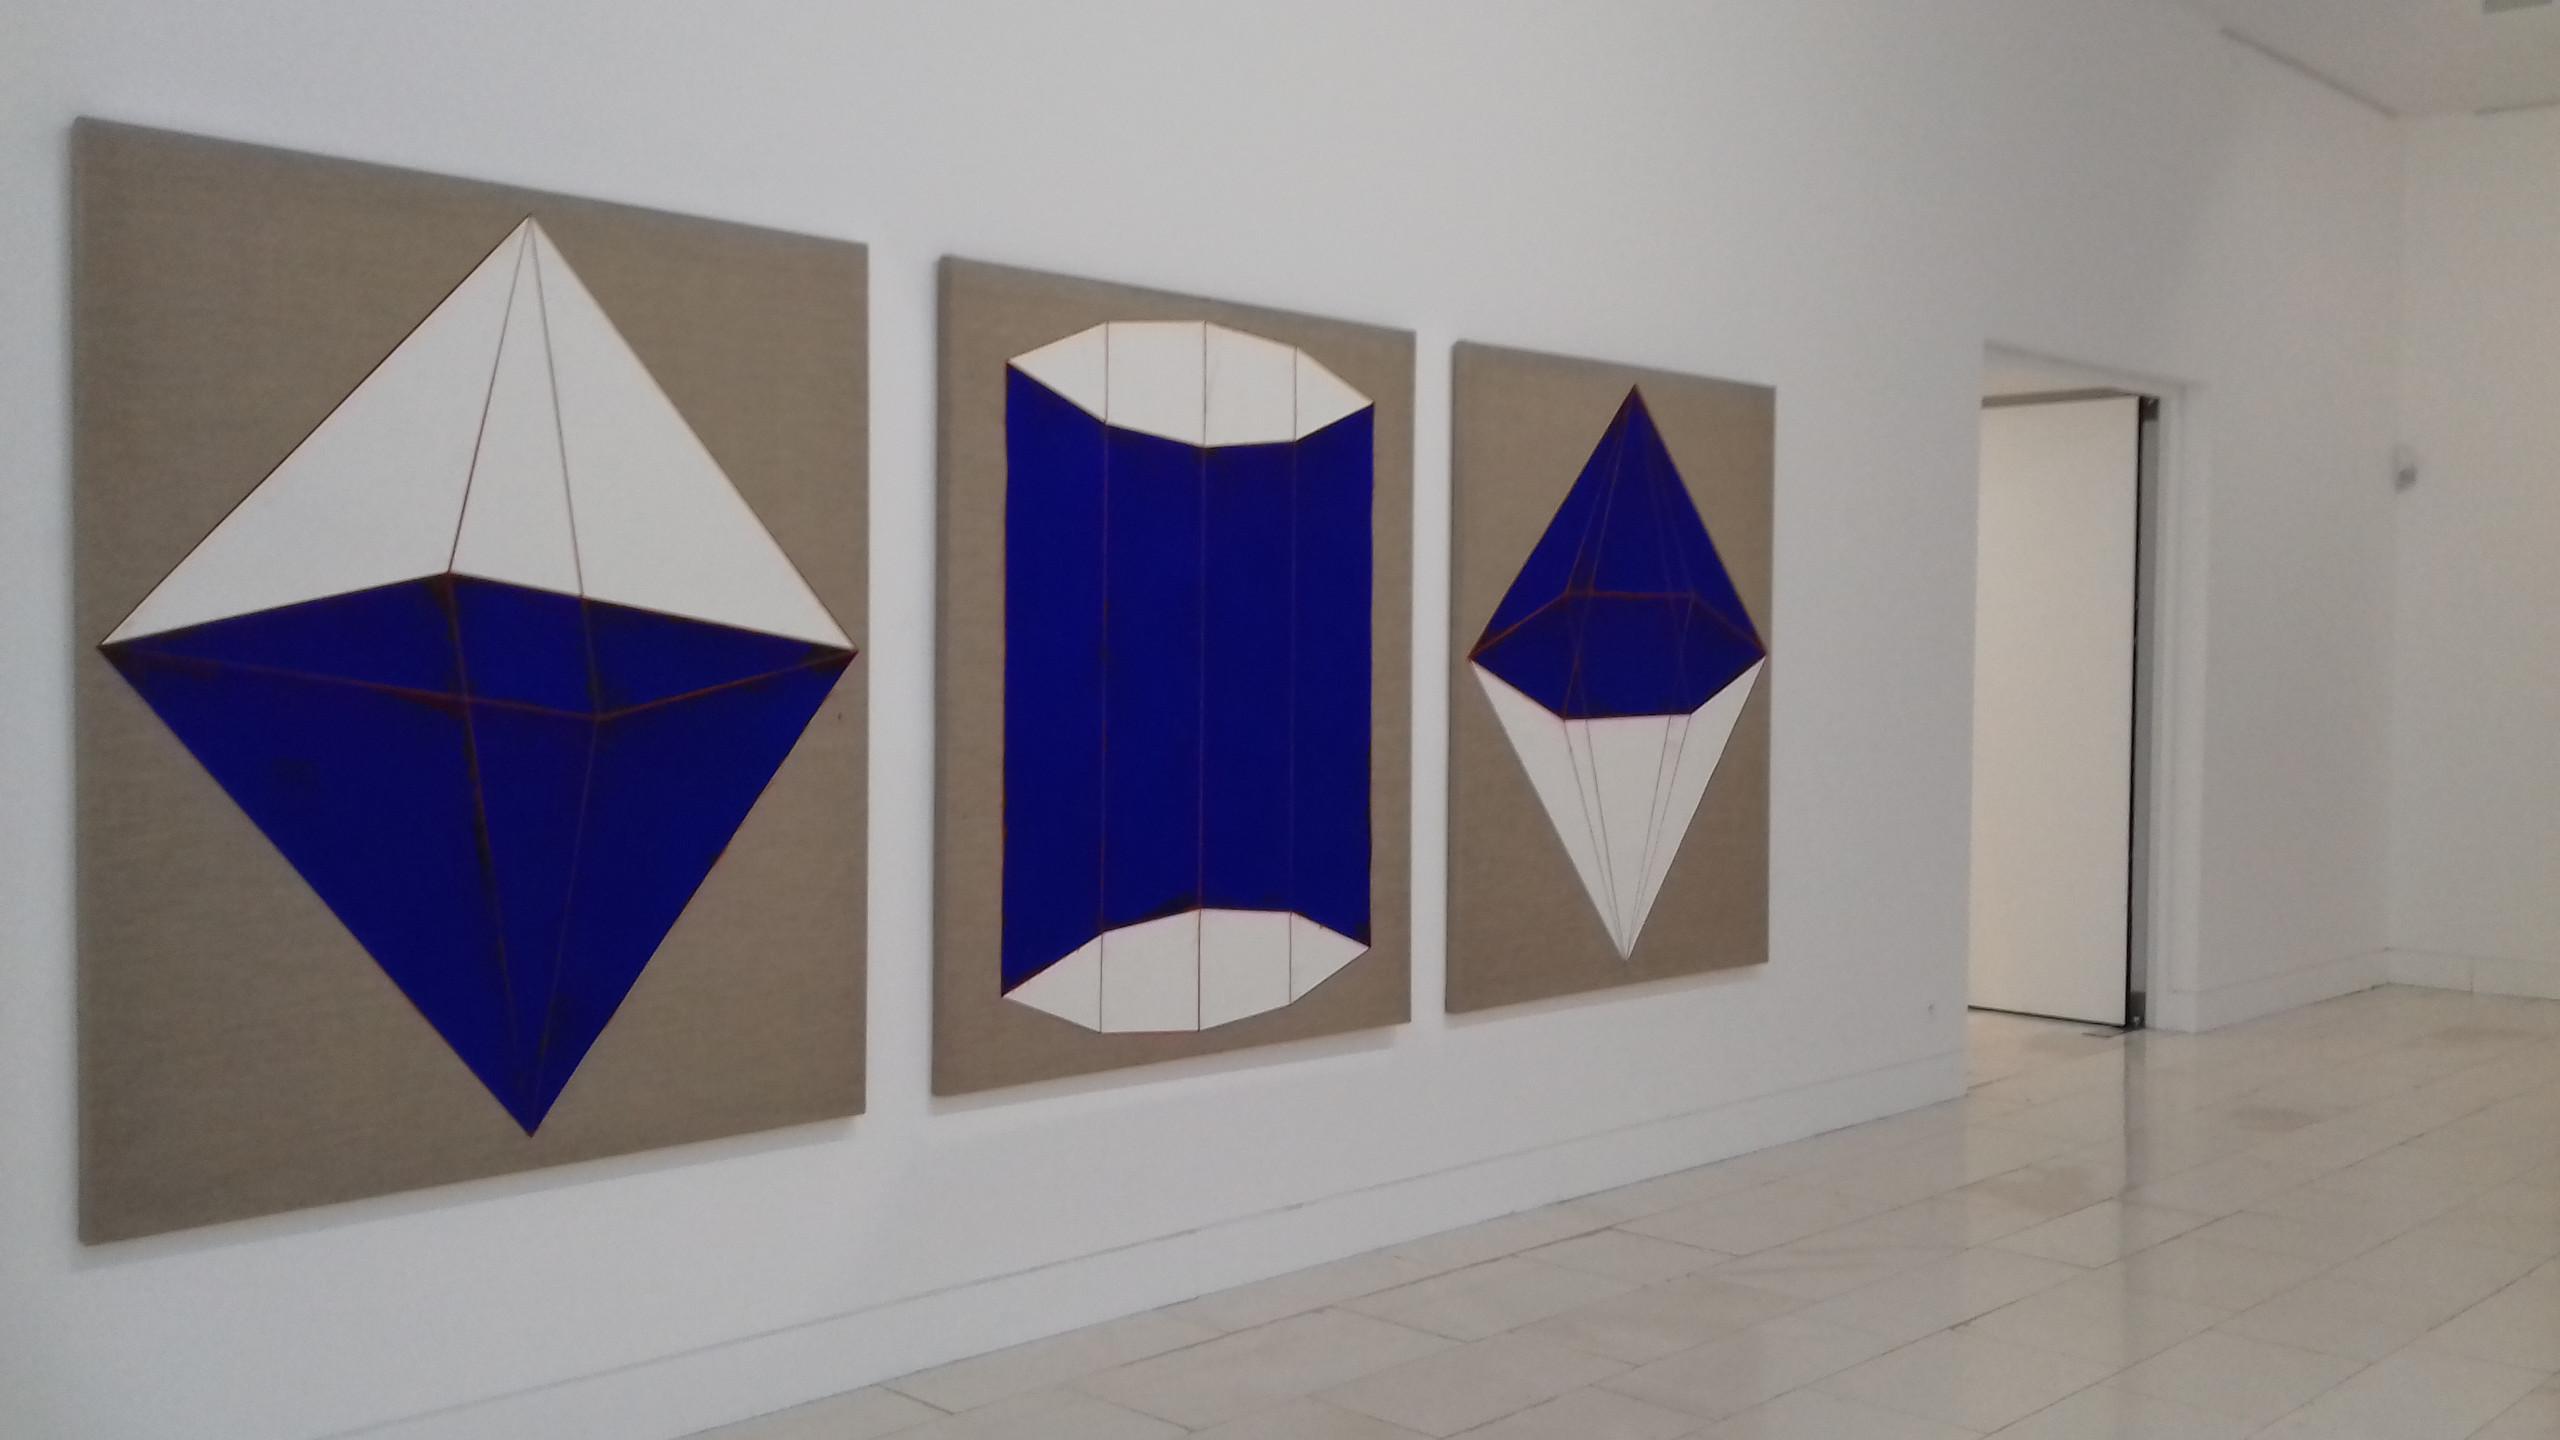 Triptyque Rhombes (1991)